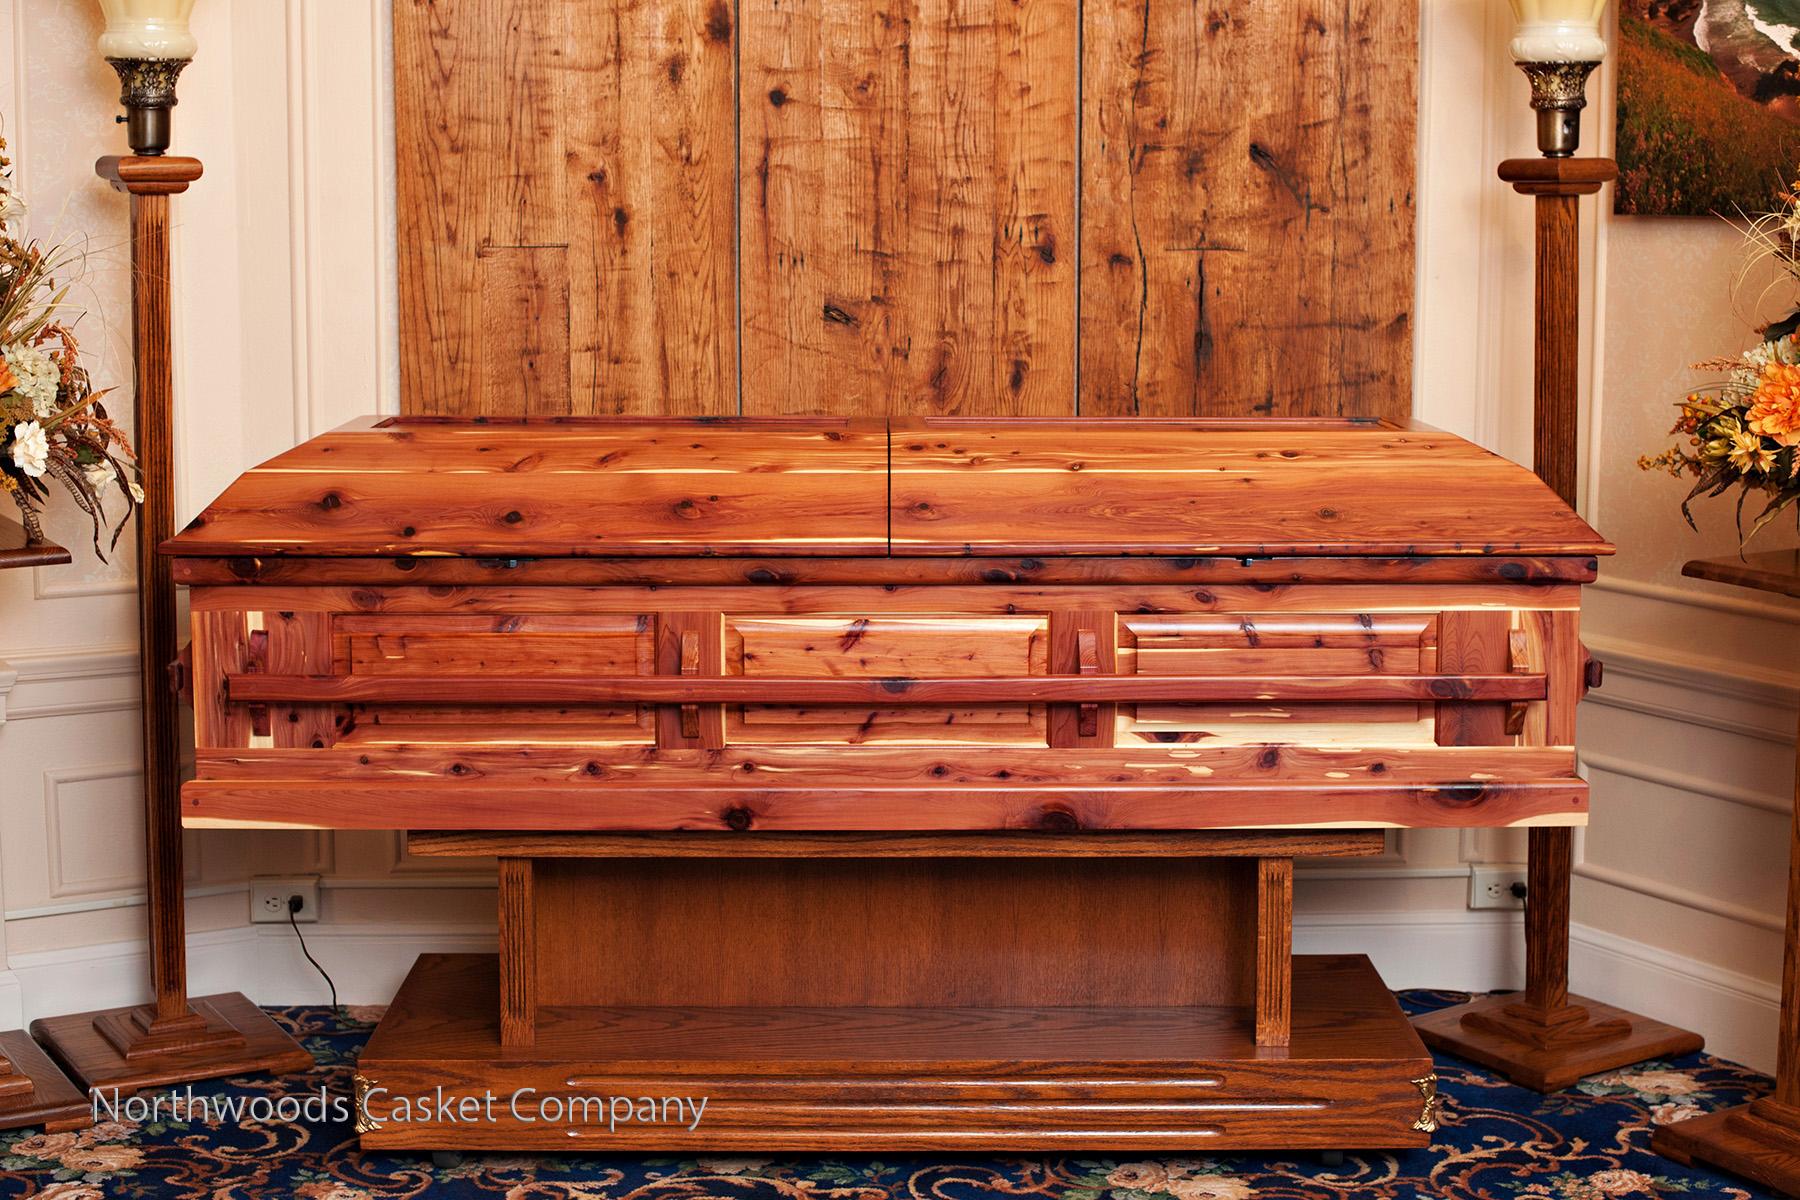 Cedar — Northwoods Casket Company